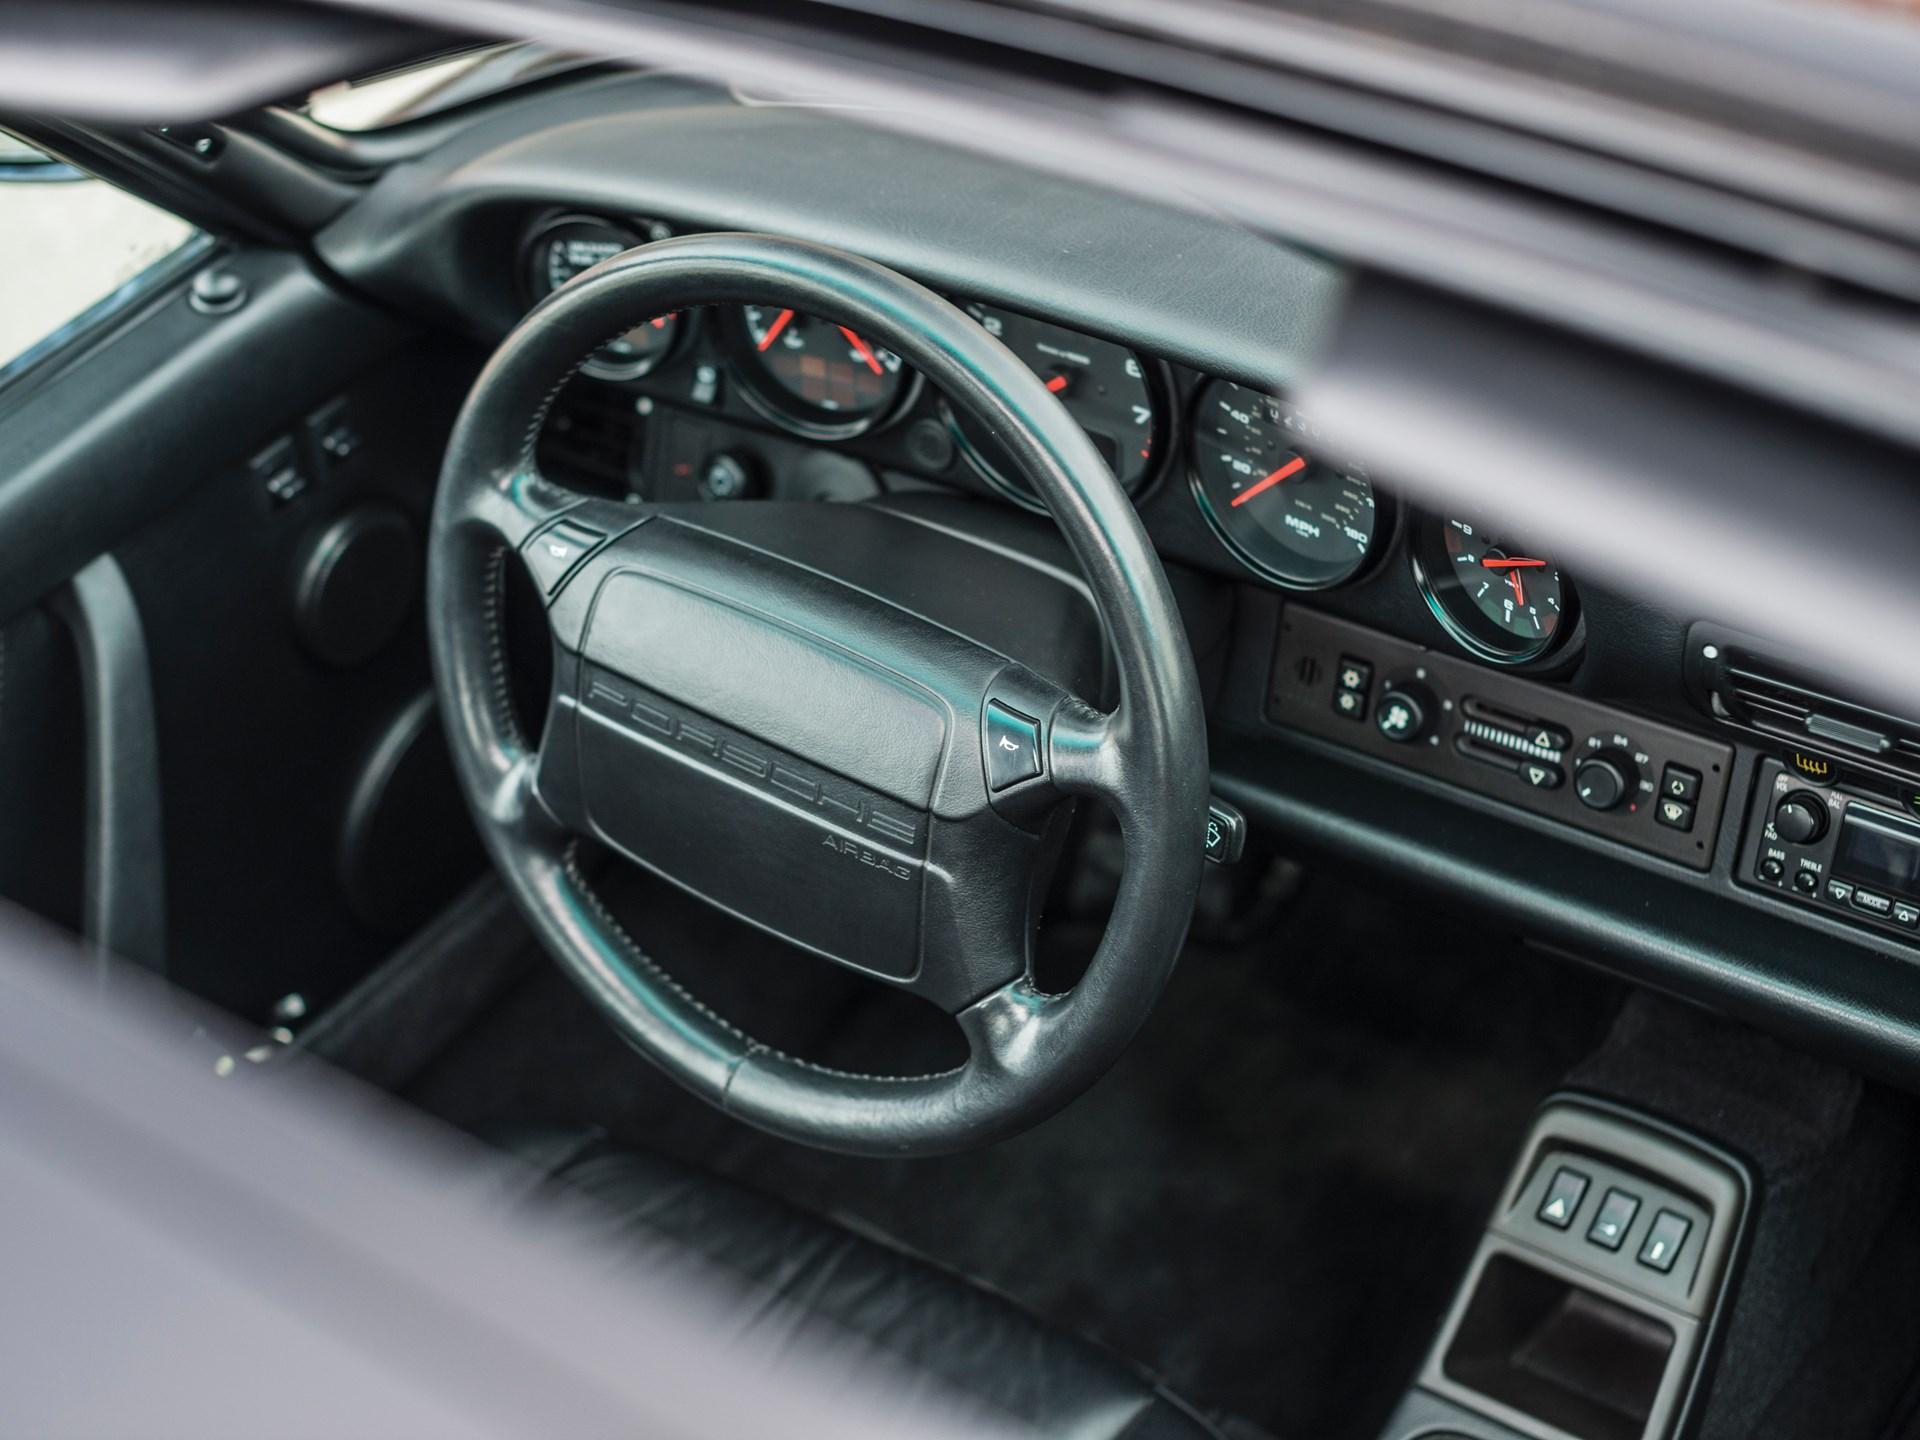 1994 Porsche 911 Turbo S 3.6